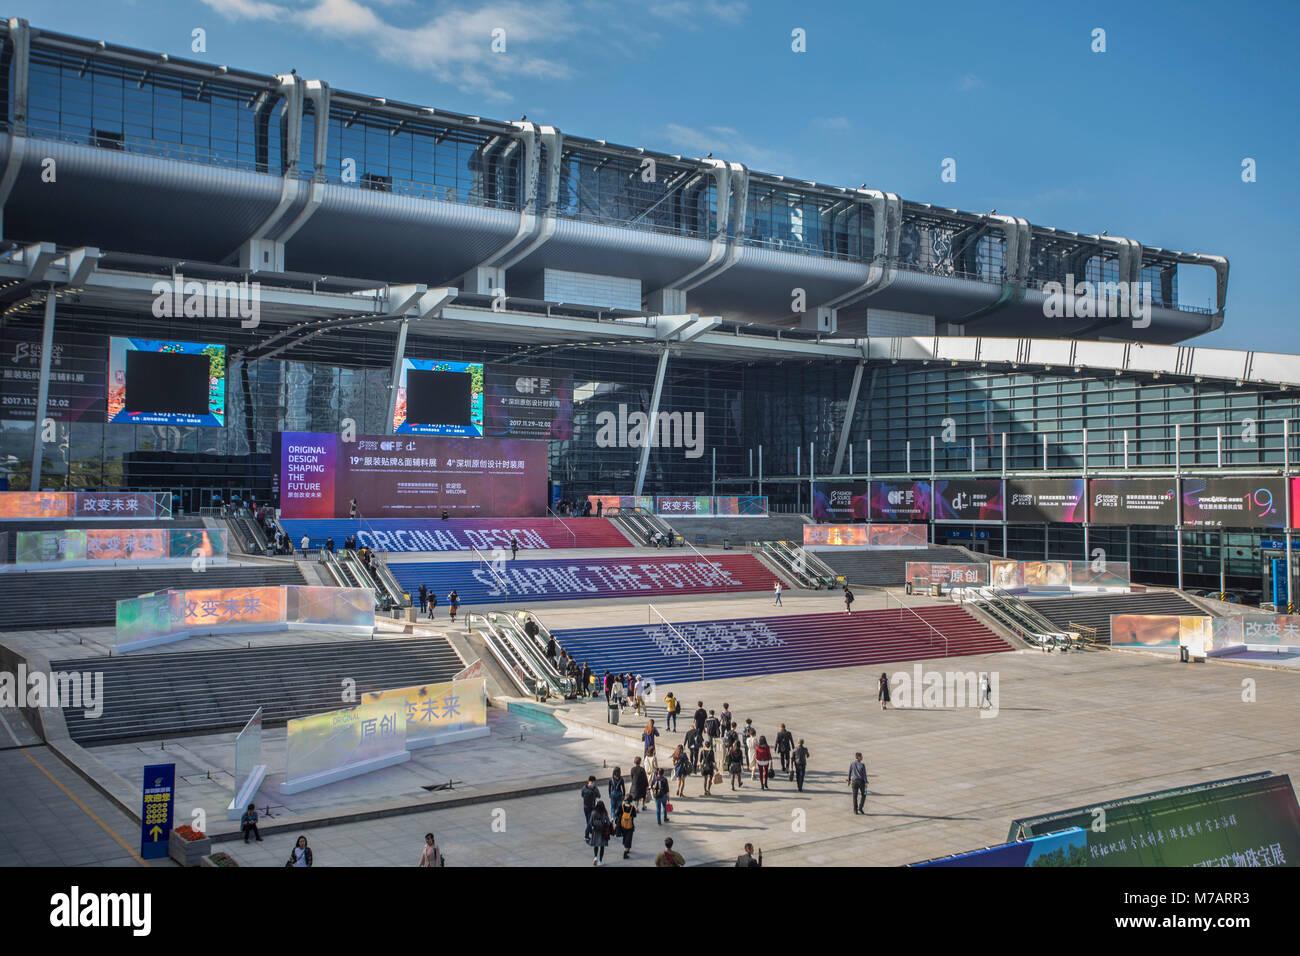 China, Shenzhen City, Fian CBD, Shenzhen Convention and exibition  Center - Stock Image